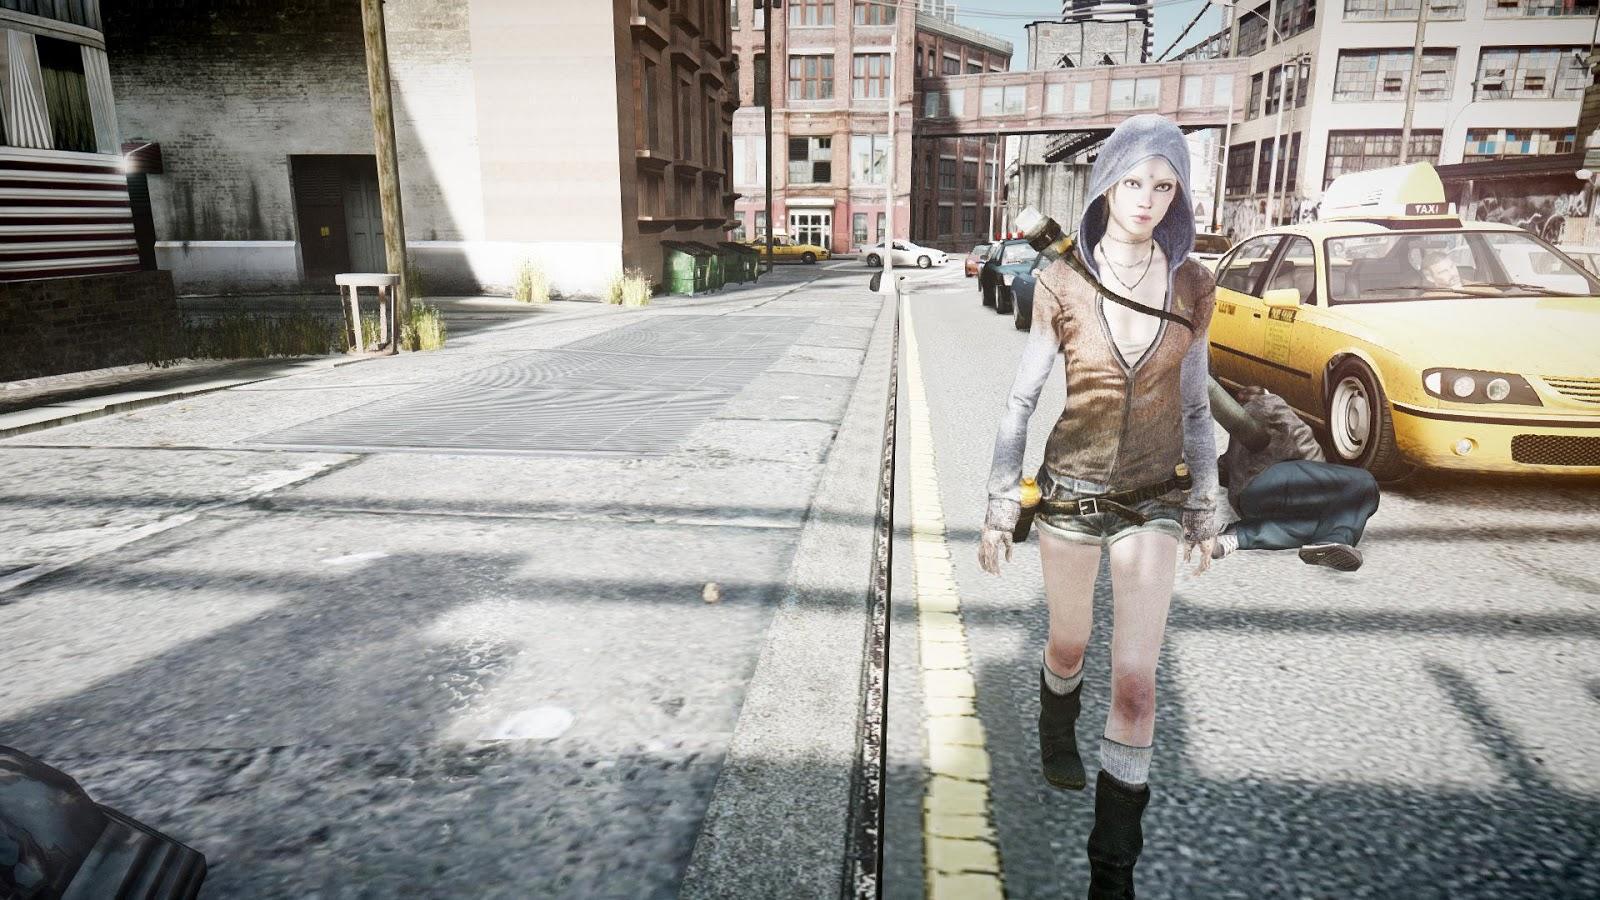 Devil May Cry Kat Pack скачать для GTA 4 — GTA.com.ua